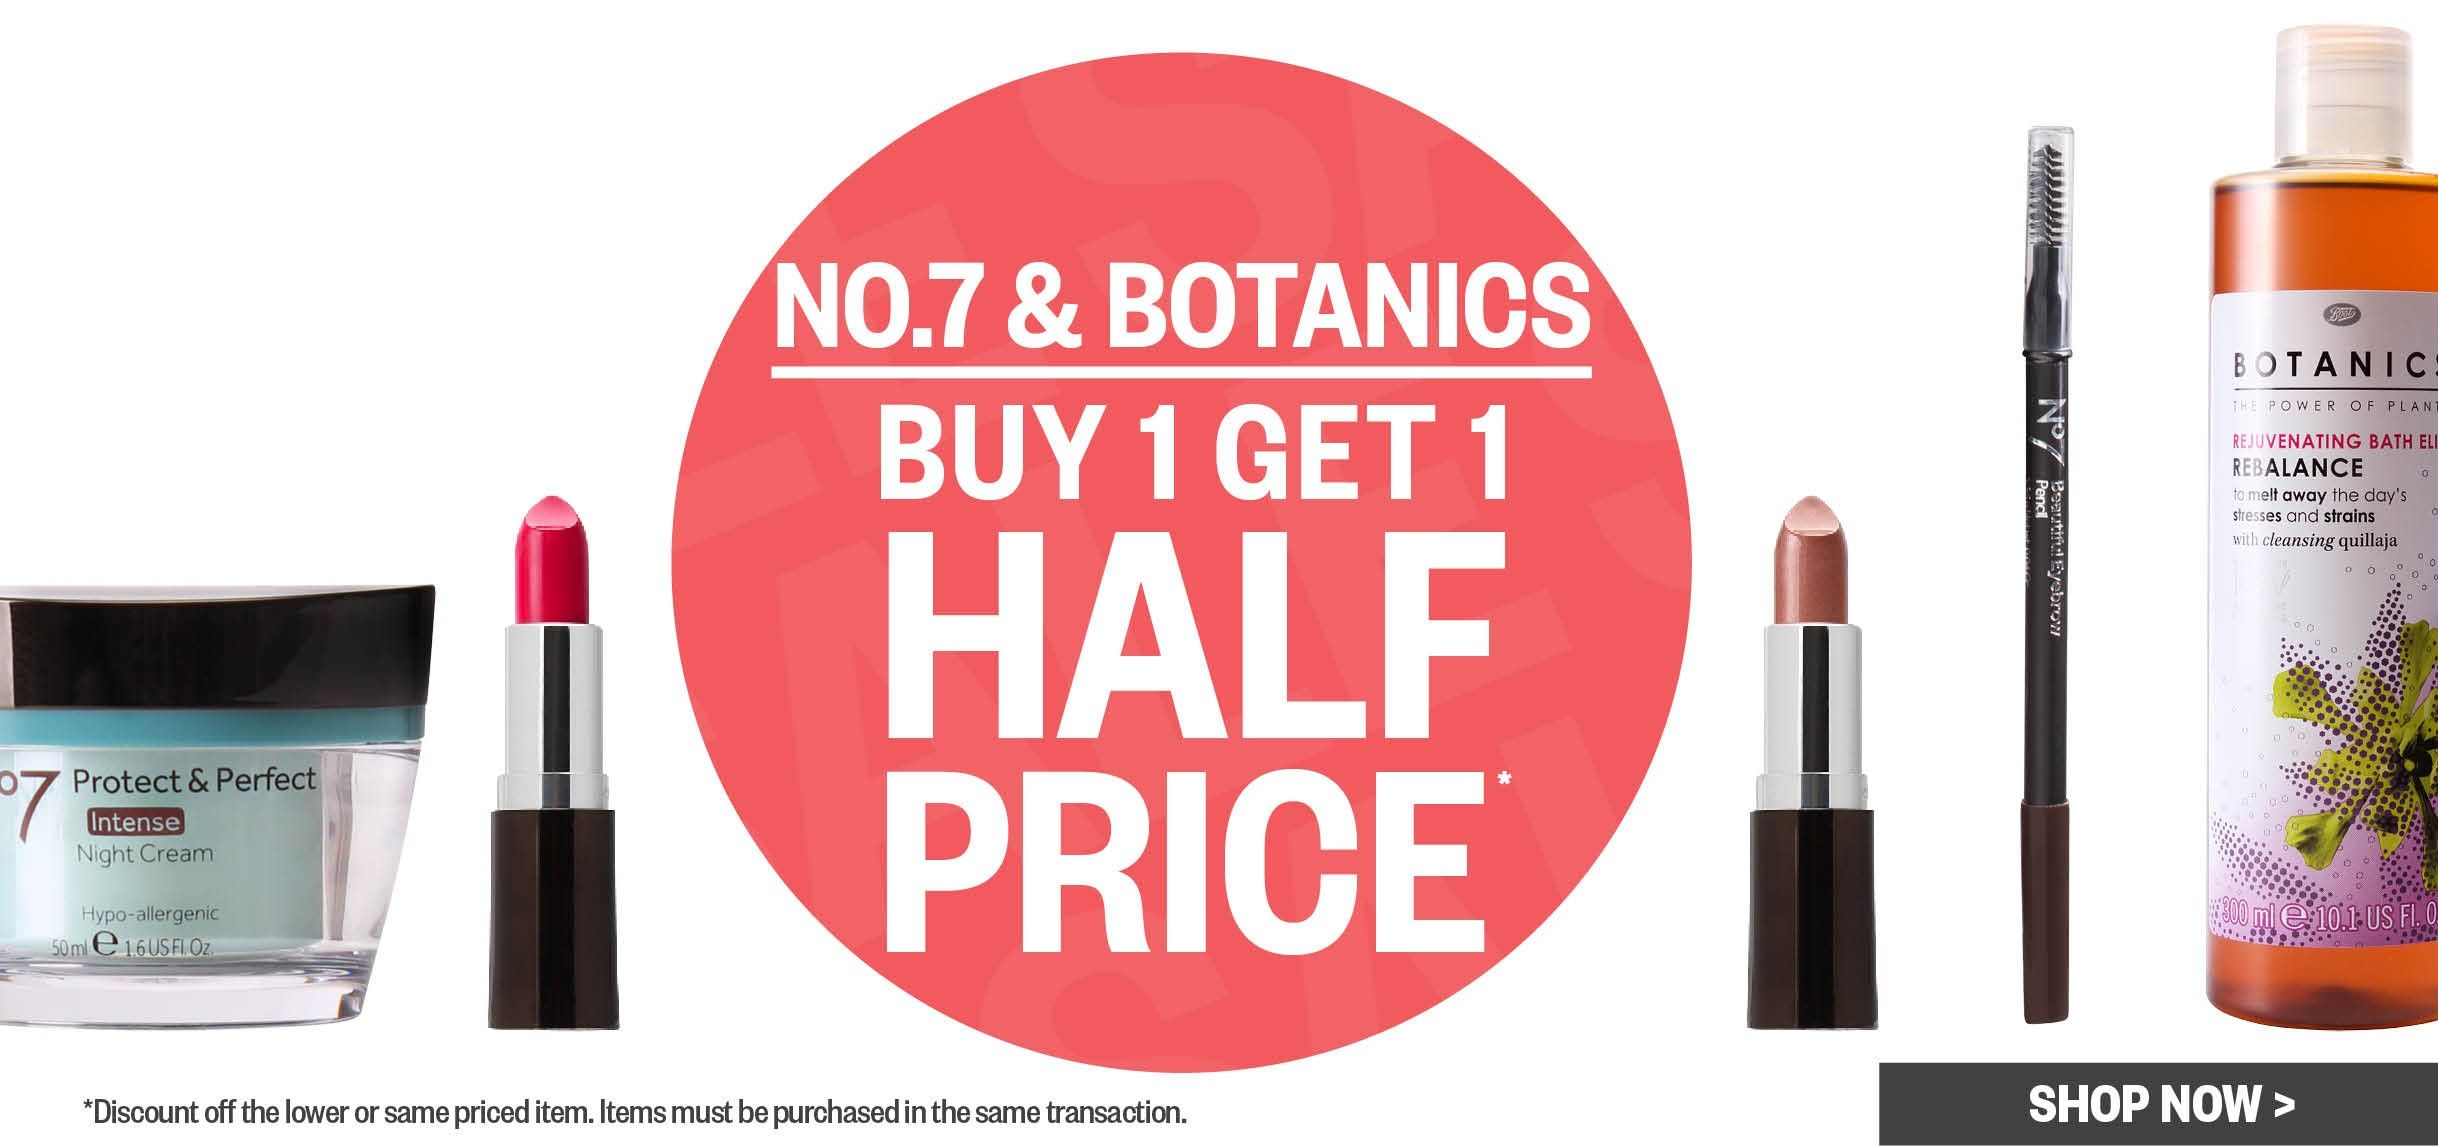 Bargain   Buy 1 Get 1 Half Price   No. 7 U0026 Botanics @ Postie